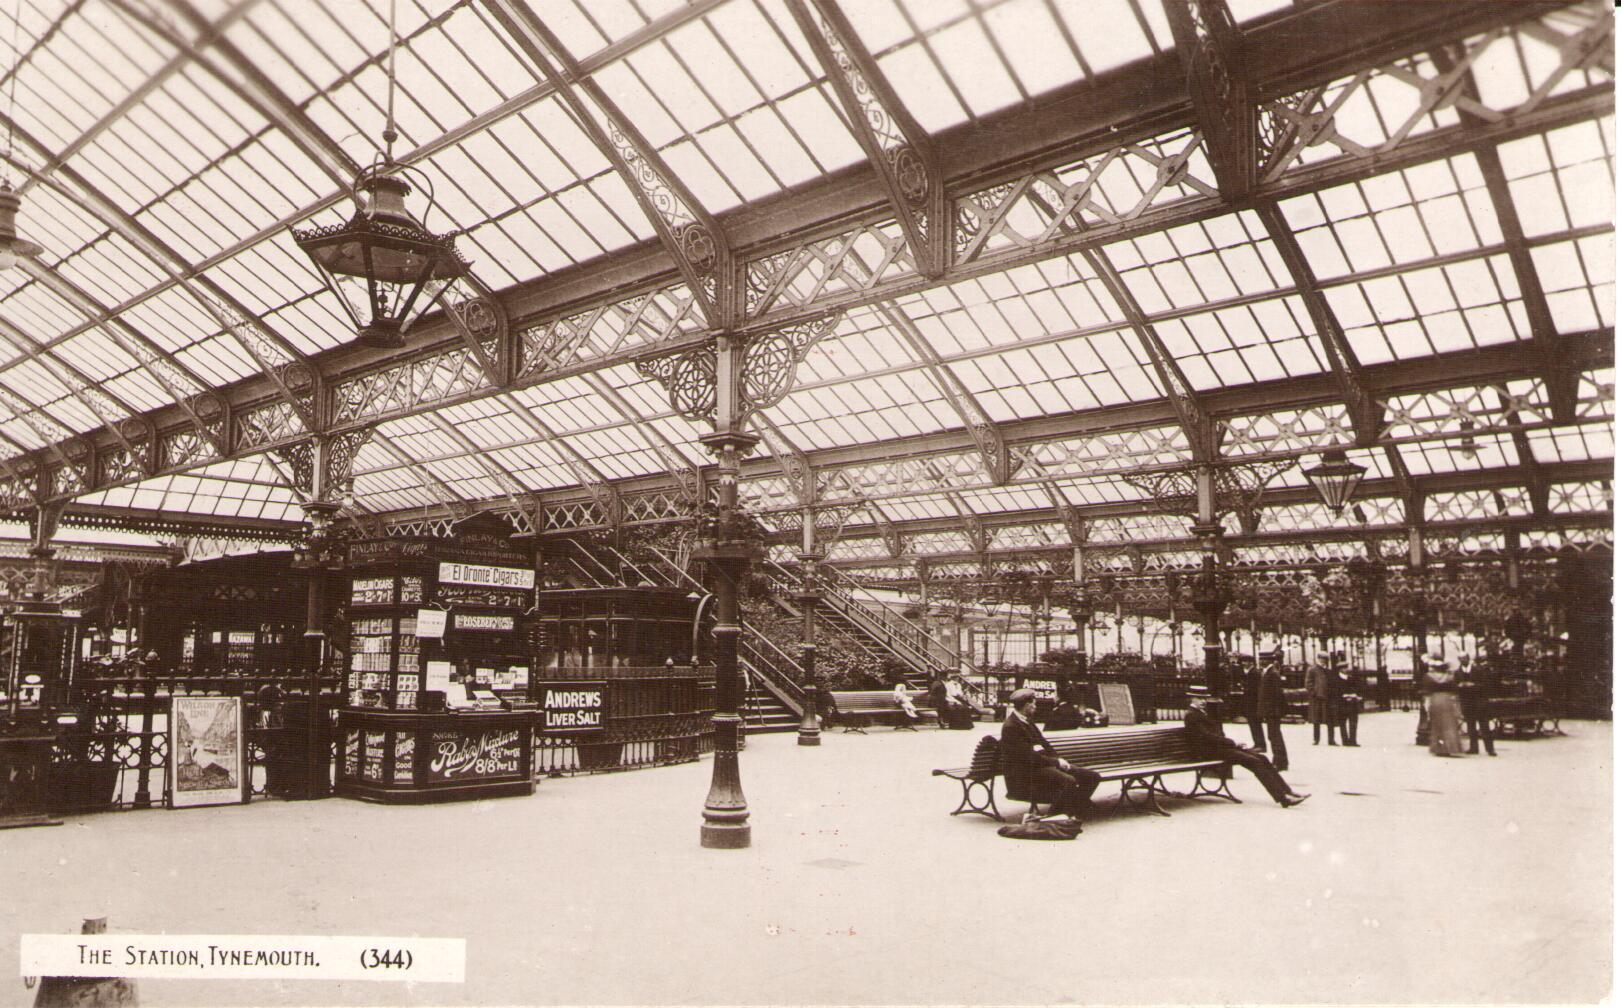 Tynemouth Station, Tynemouth